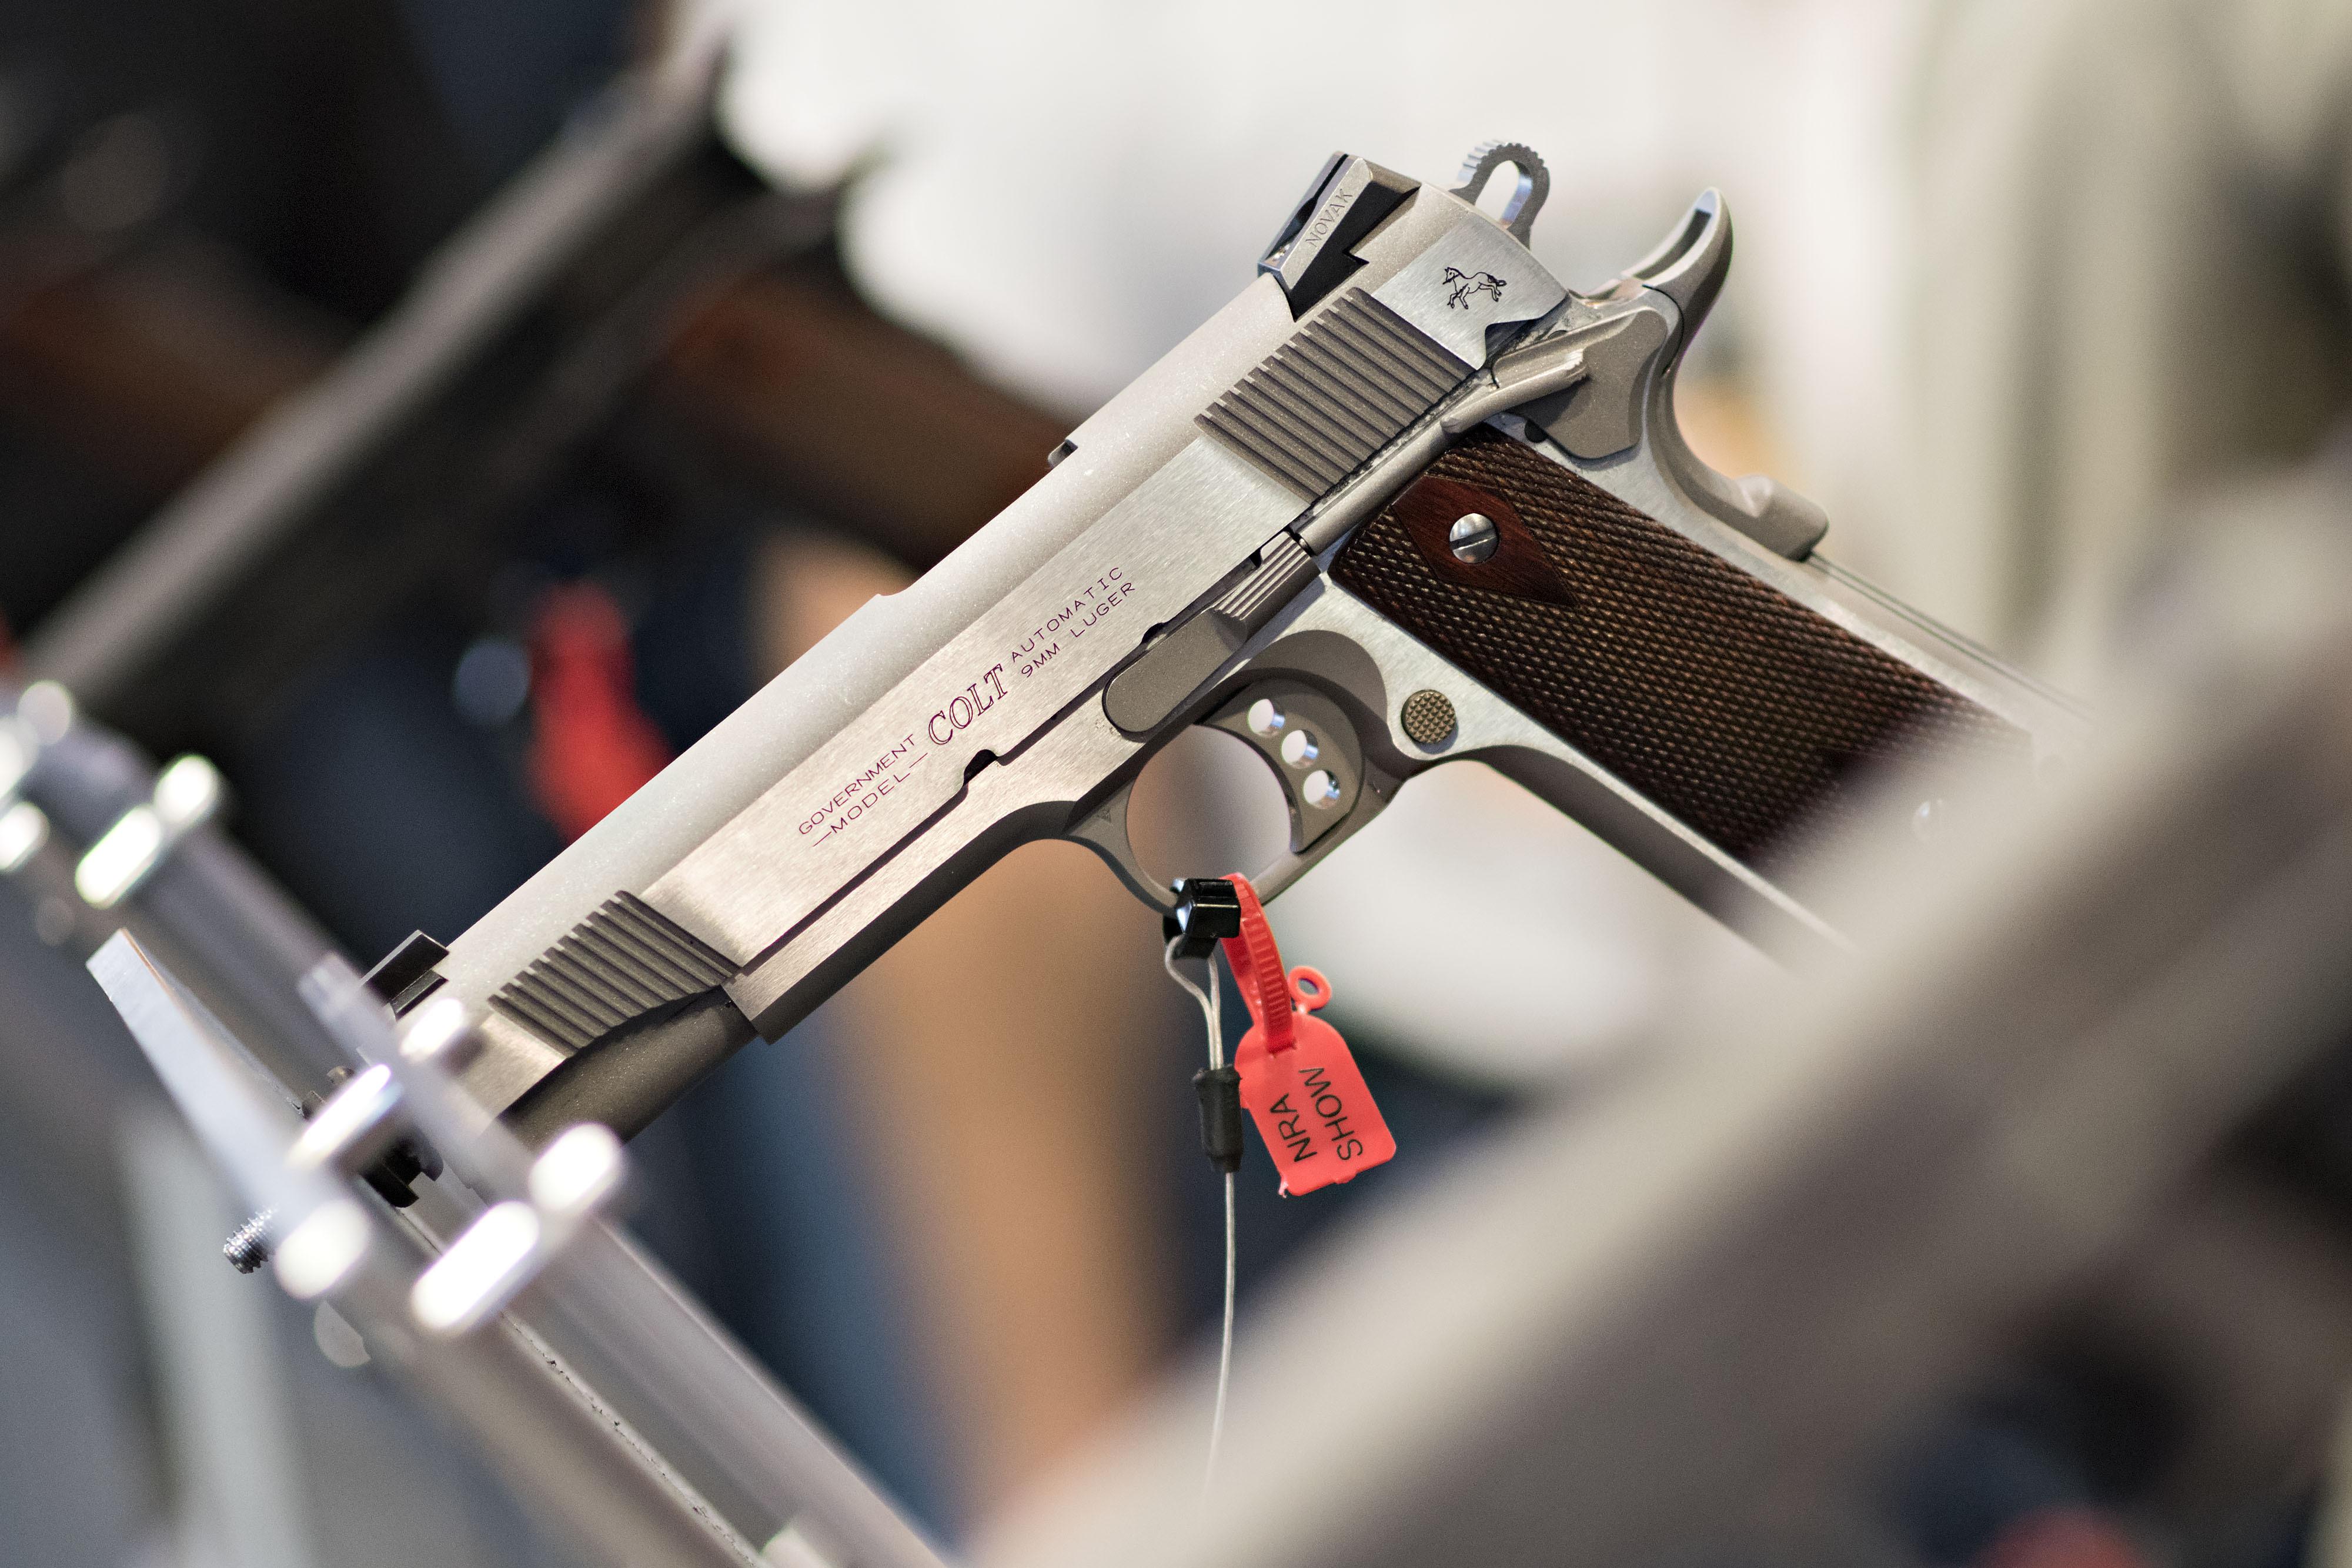 Reddit Wades Into the Gun Control Debate - Bloomberg